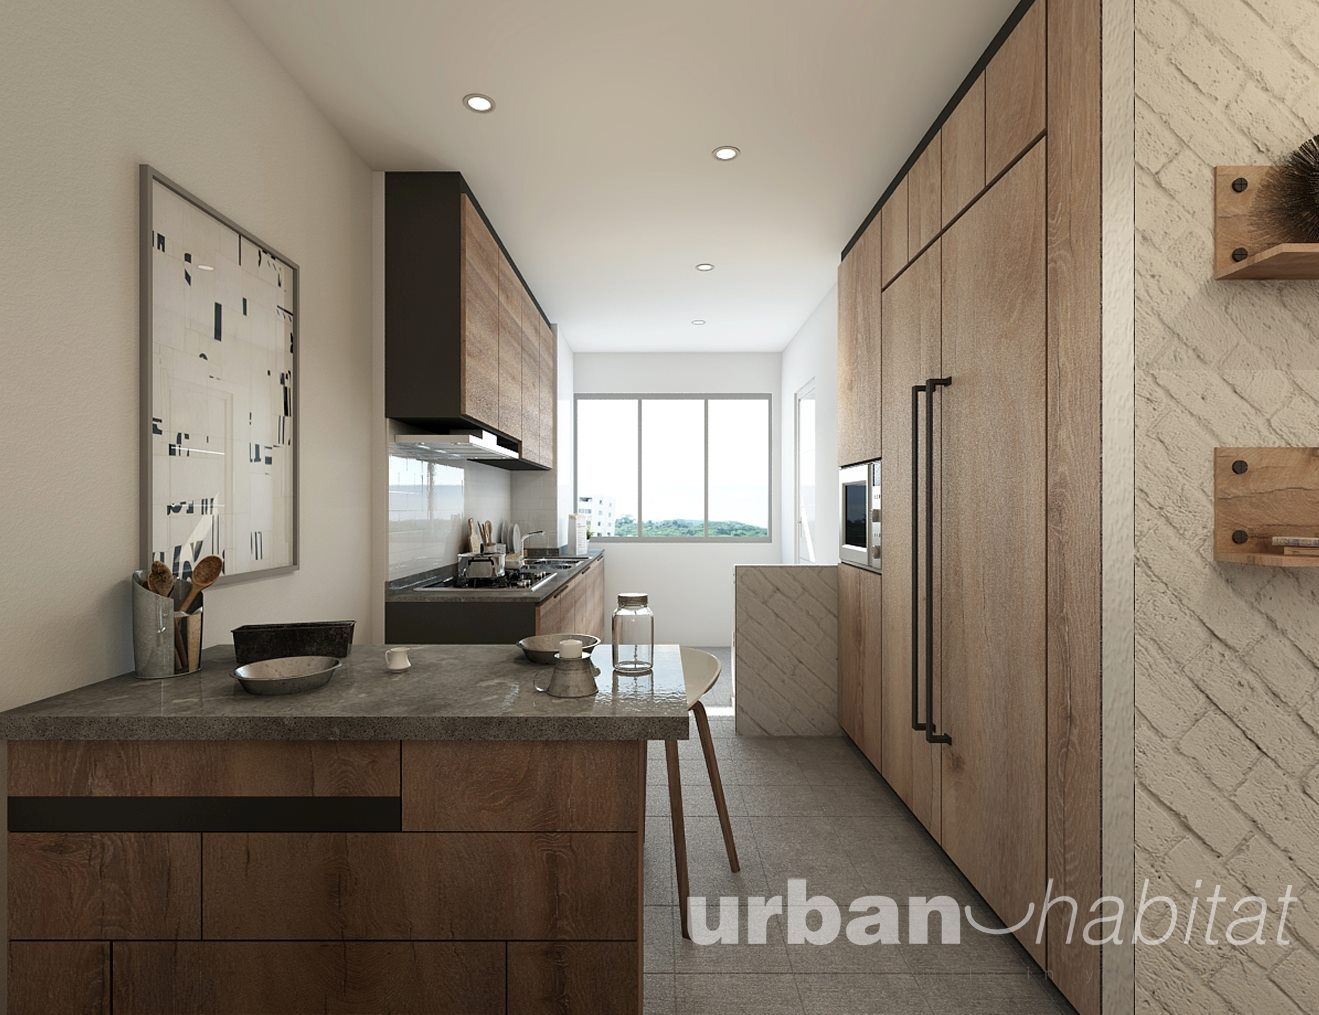 HDB 3-Room Resale Modern Eclectic @ Serangoon North - Interior ...